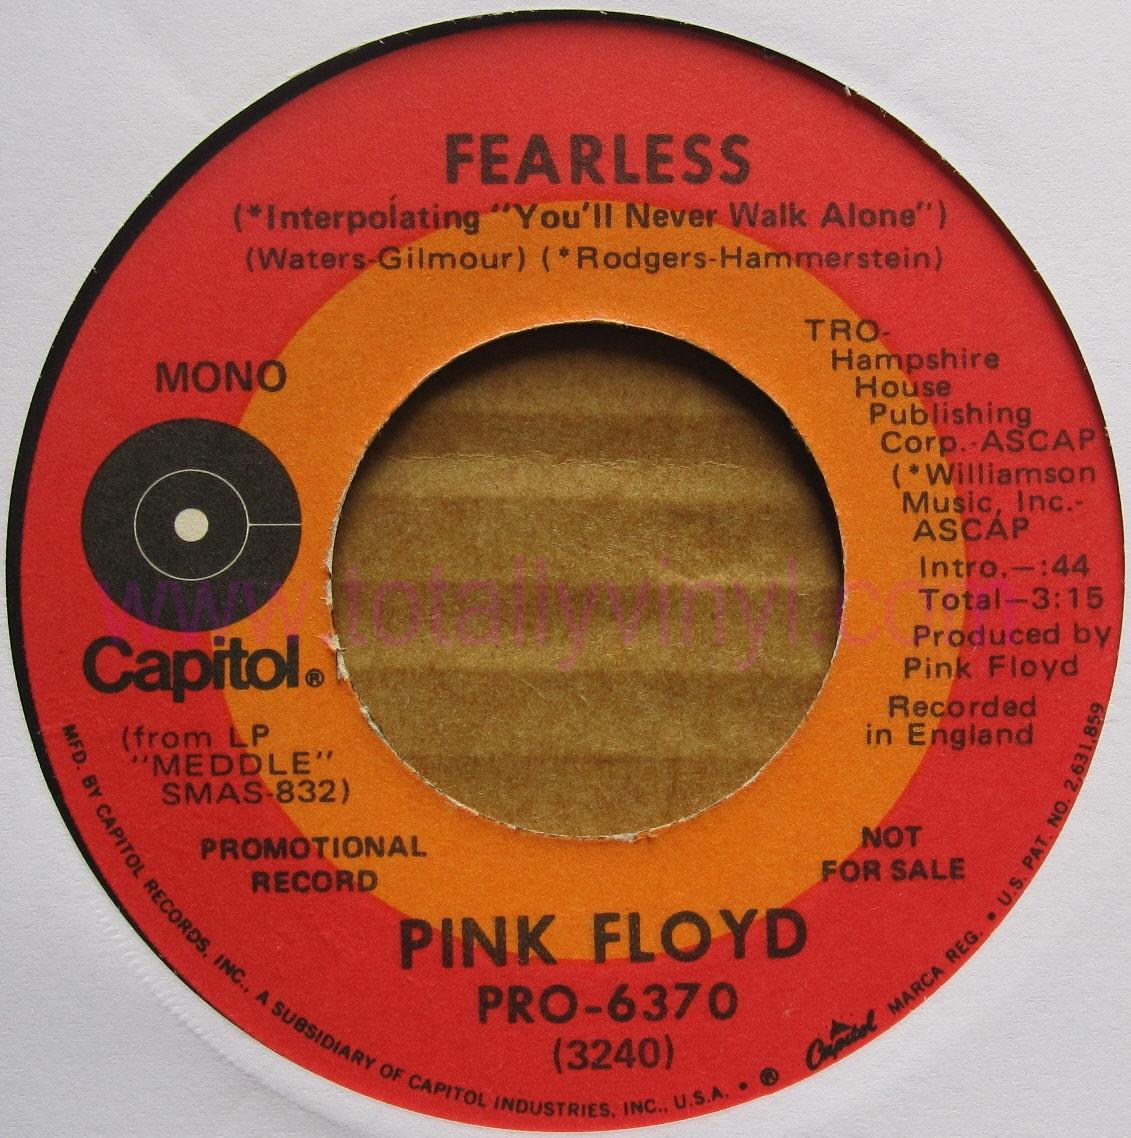 PINK_FLOYD_FEARLESS_USA_DJ_7